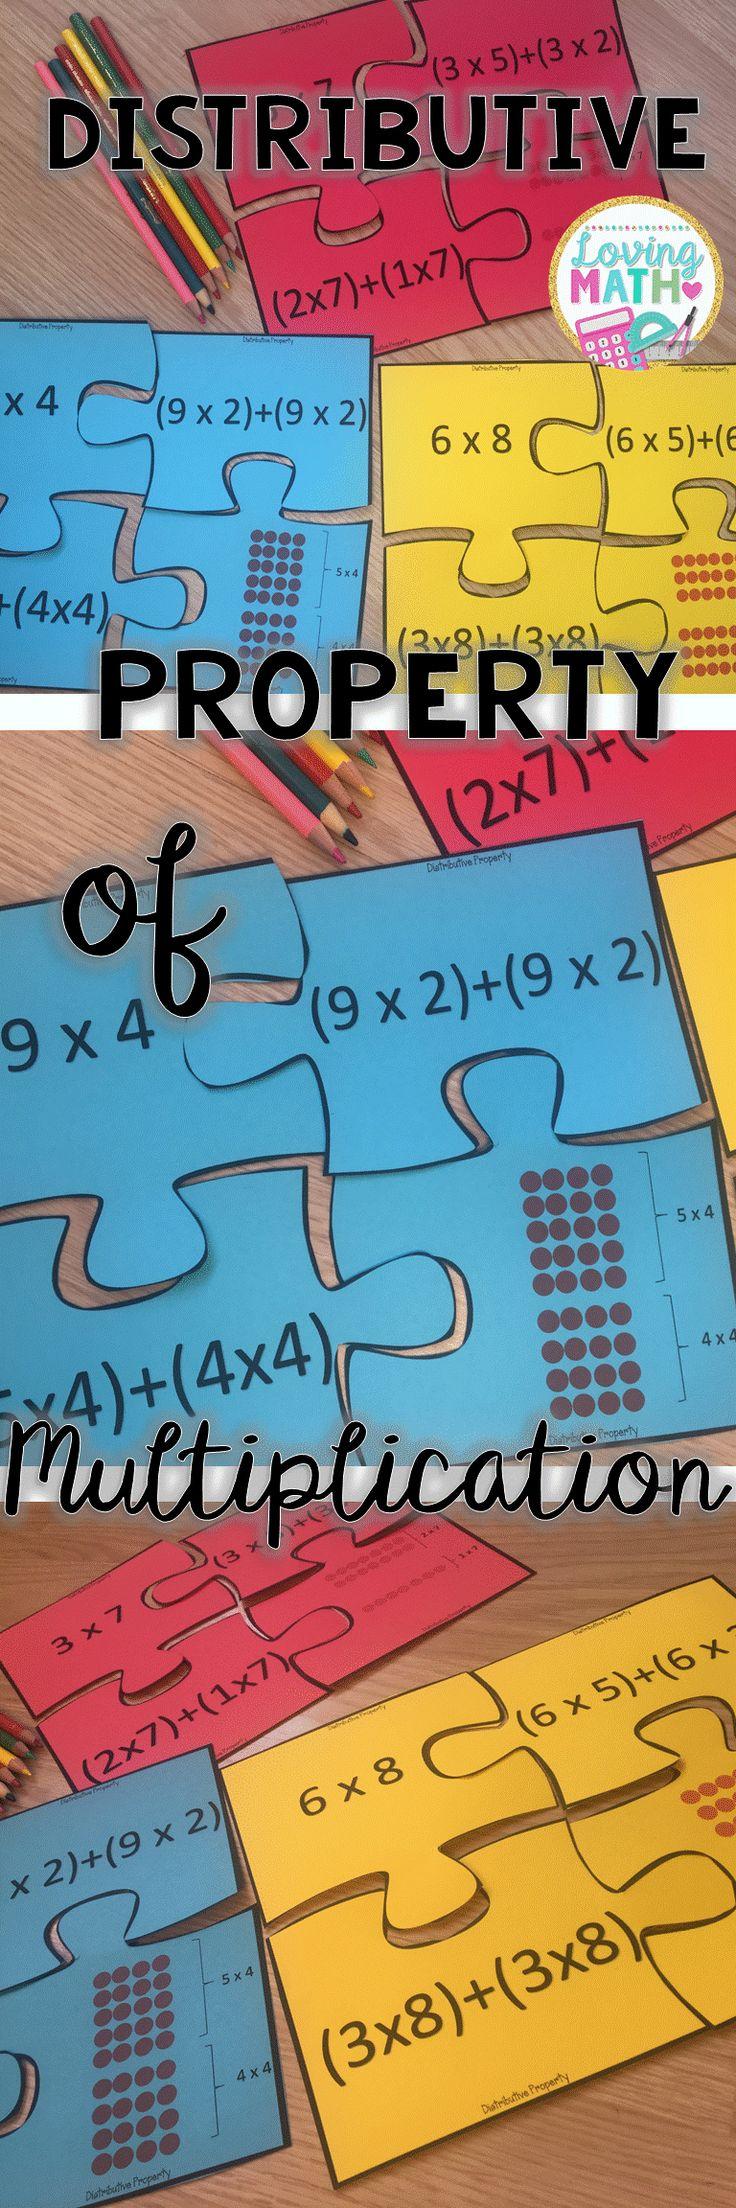 396 best Multiplication images on Pinterest | Math activities ...